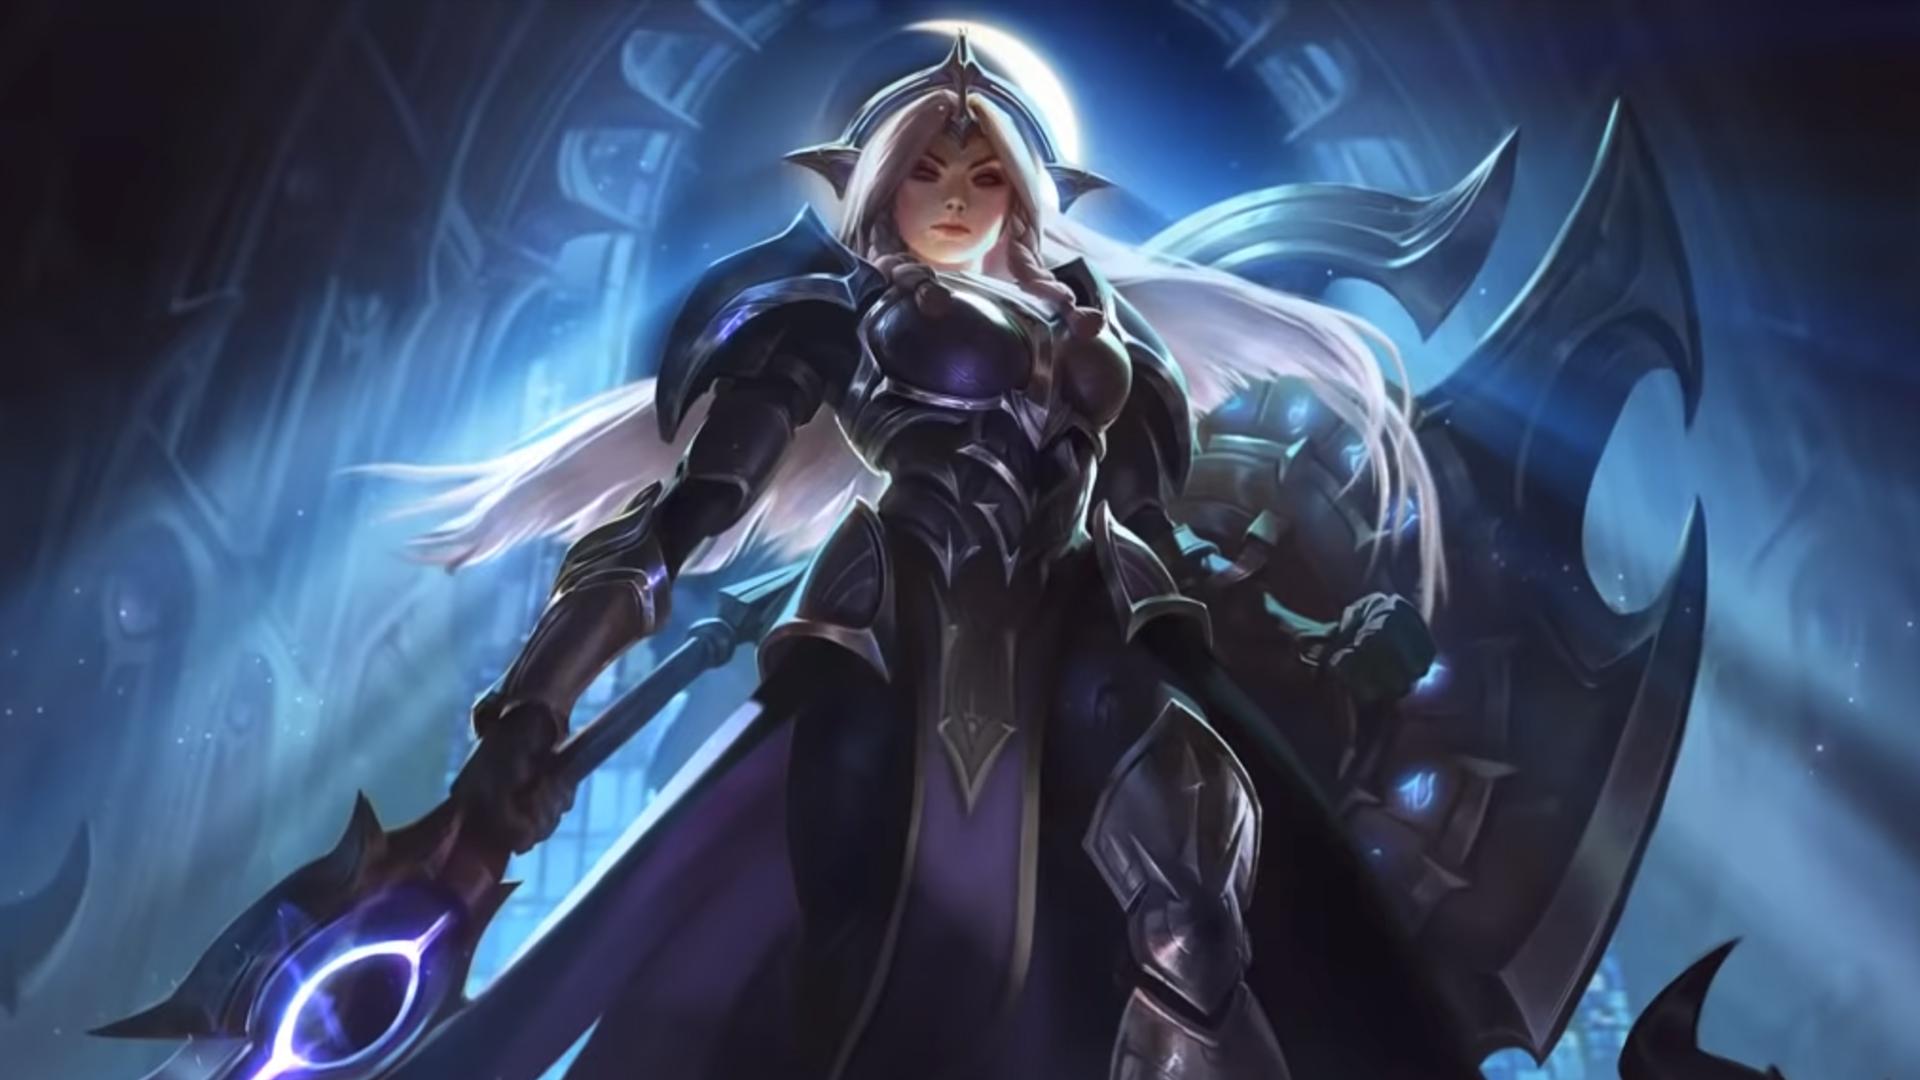 Eclipse Leona Skins Come To League Of Legends Tomorrow